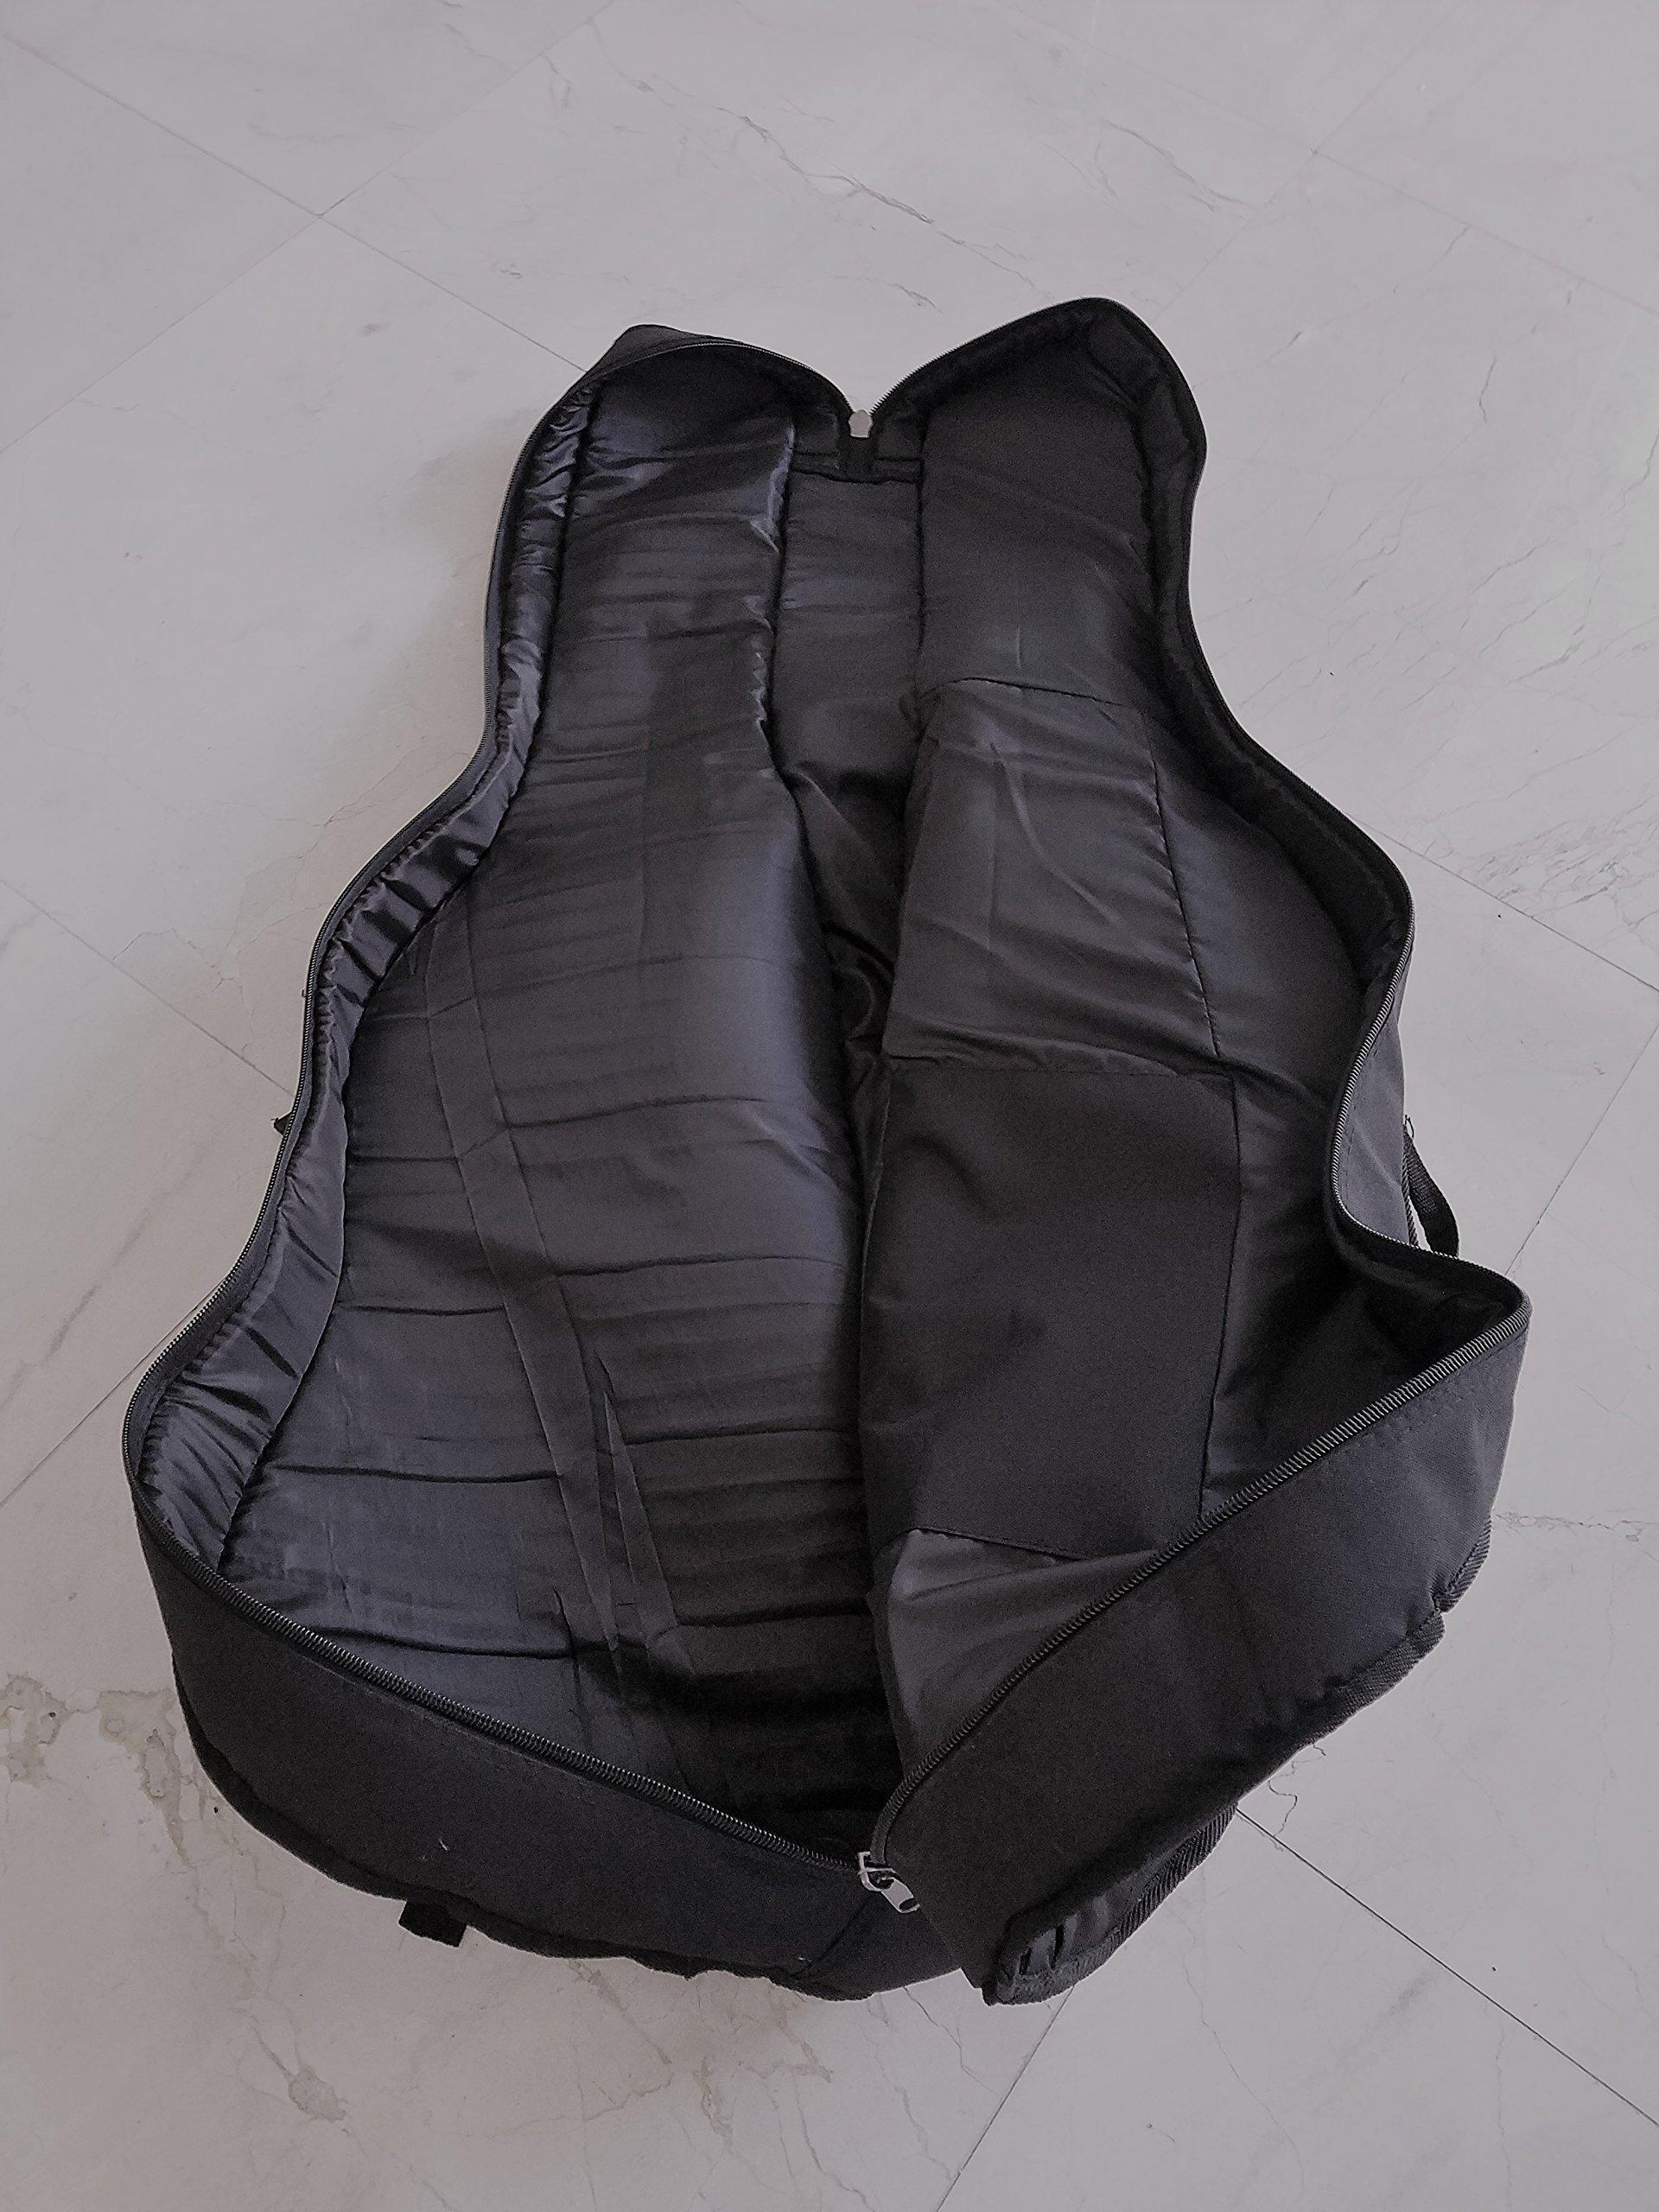 Cello Bag (4/4) by Stravari - Old Master Brand (Image #3)